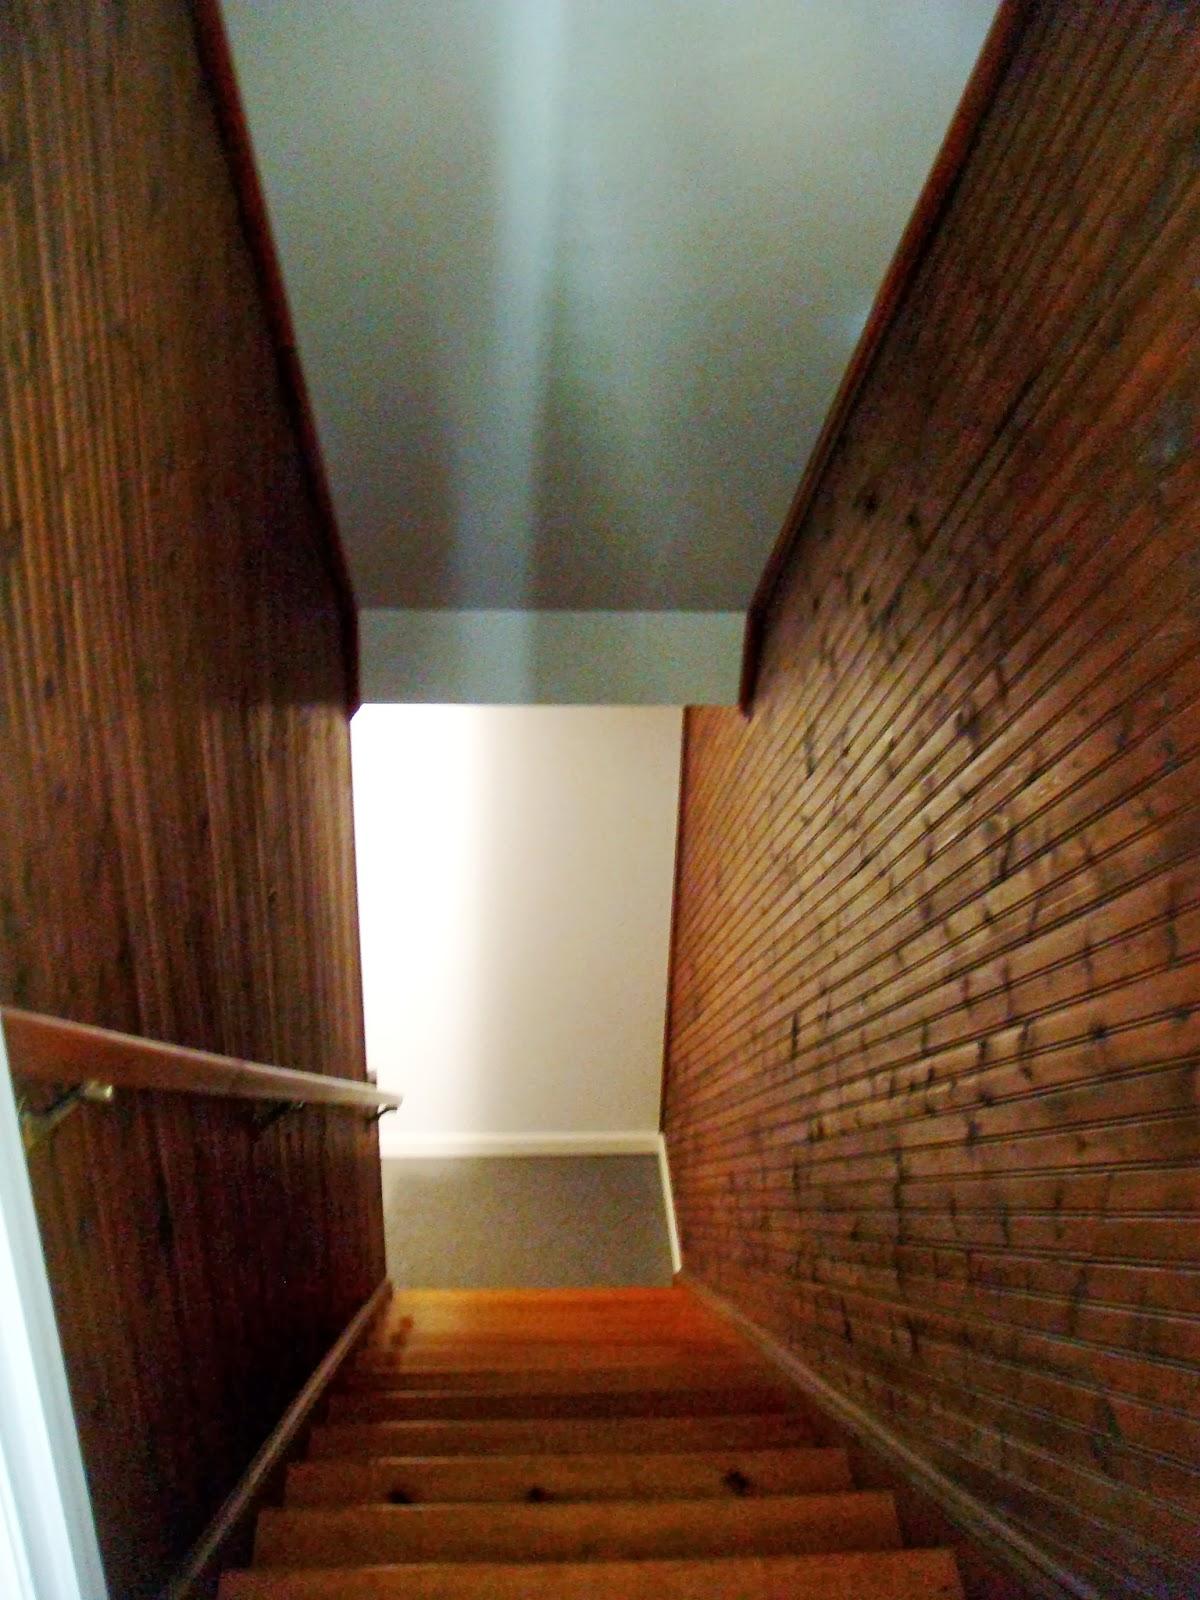 Lighting Basement Washroom Stairs: Sweet Magnolia Way: Brightening Up The Stairs